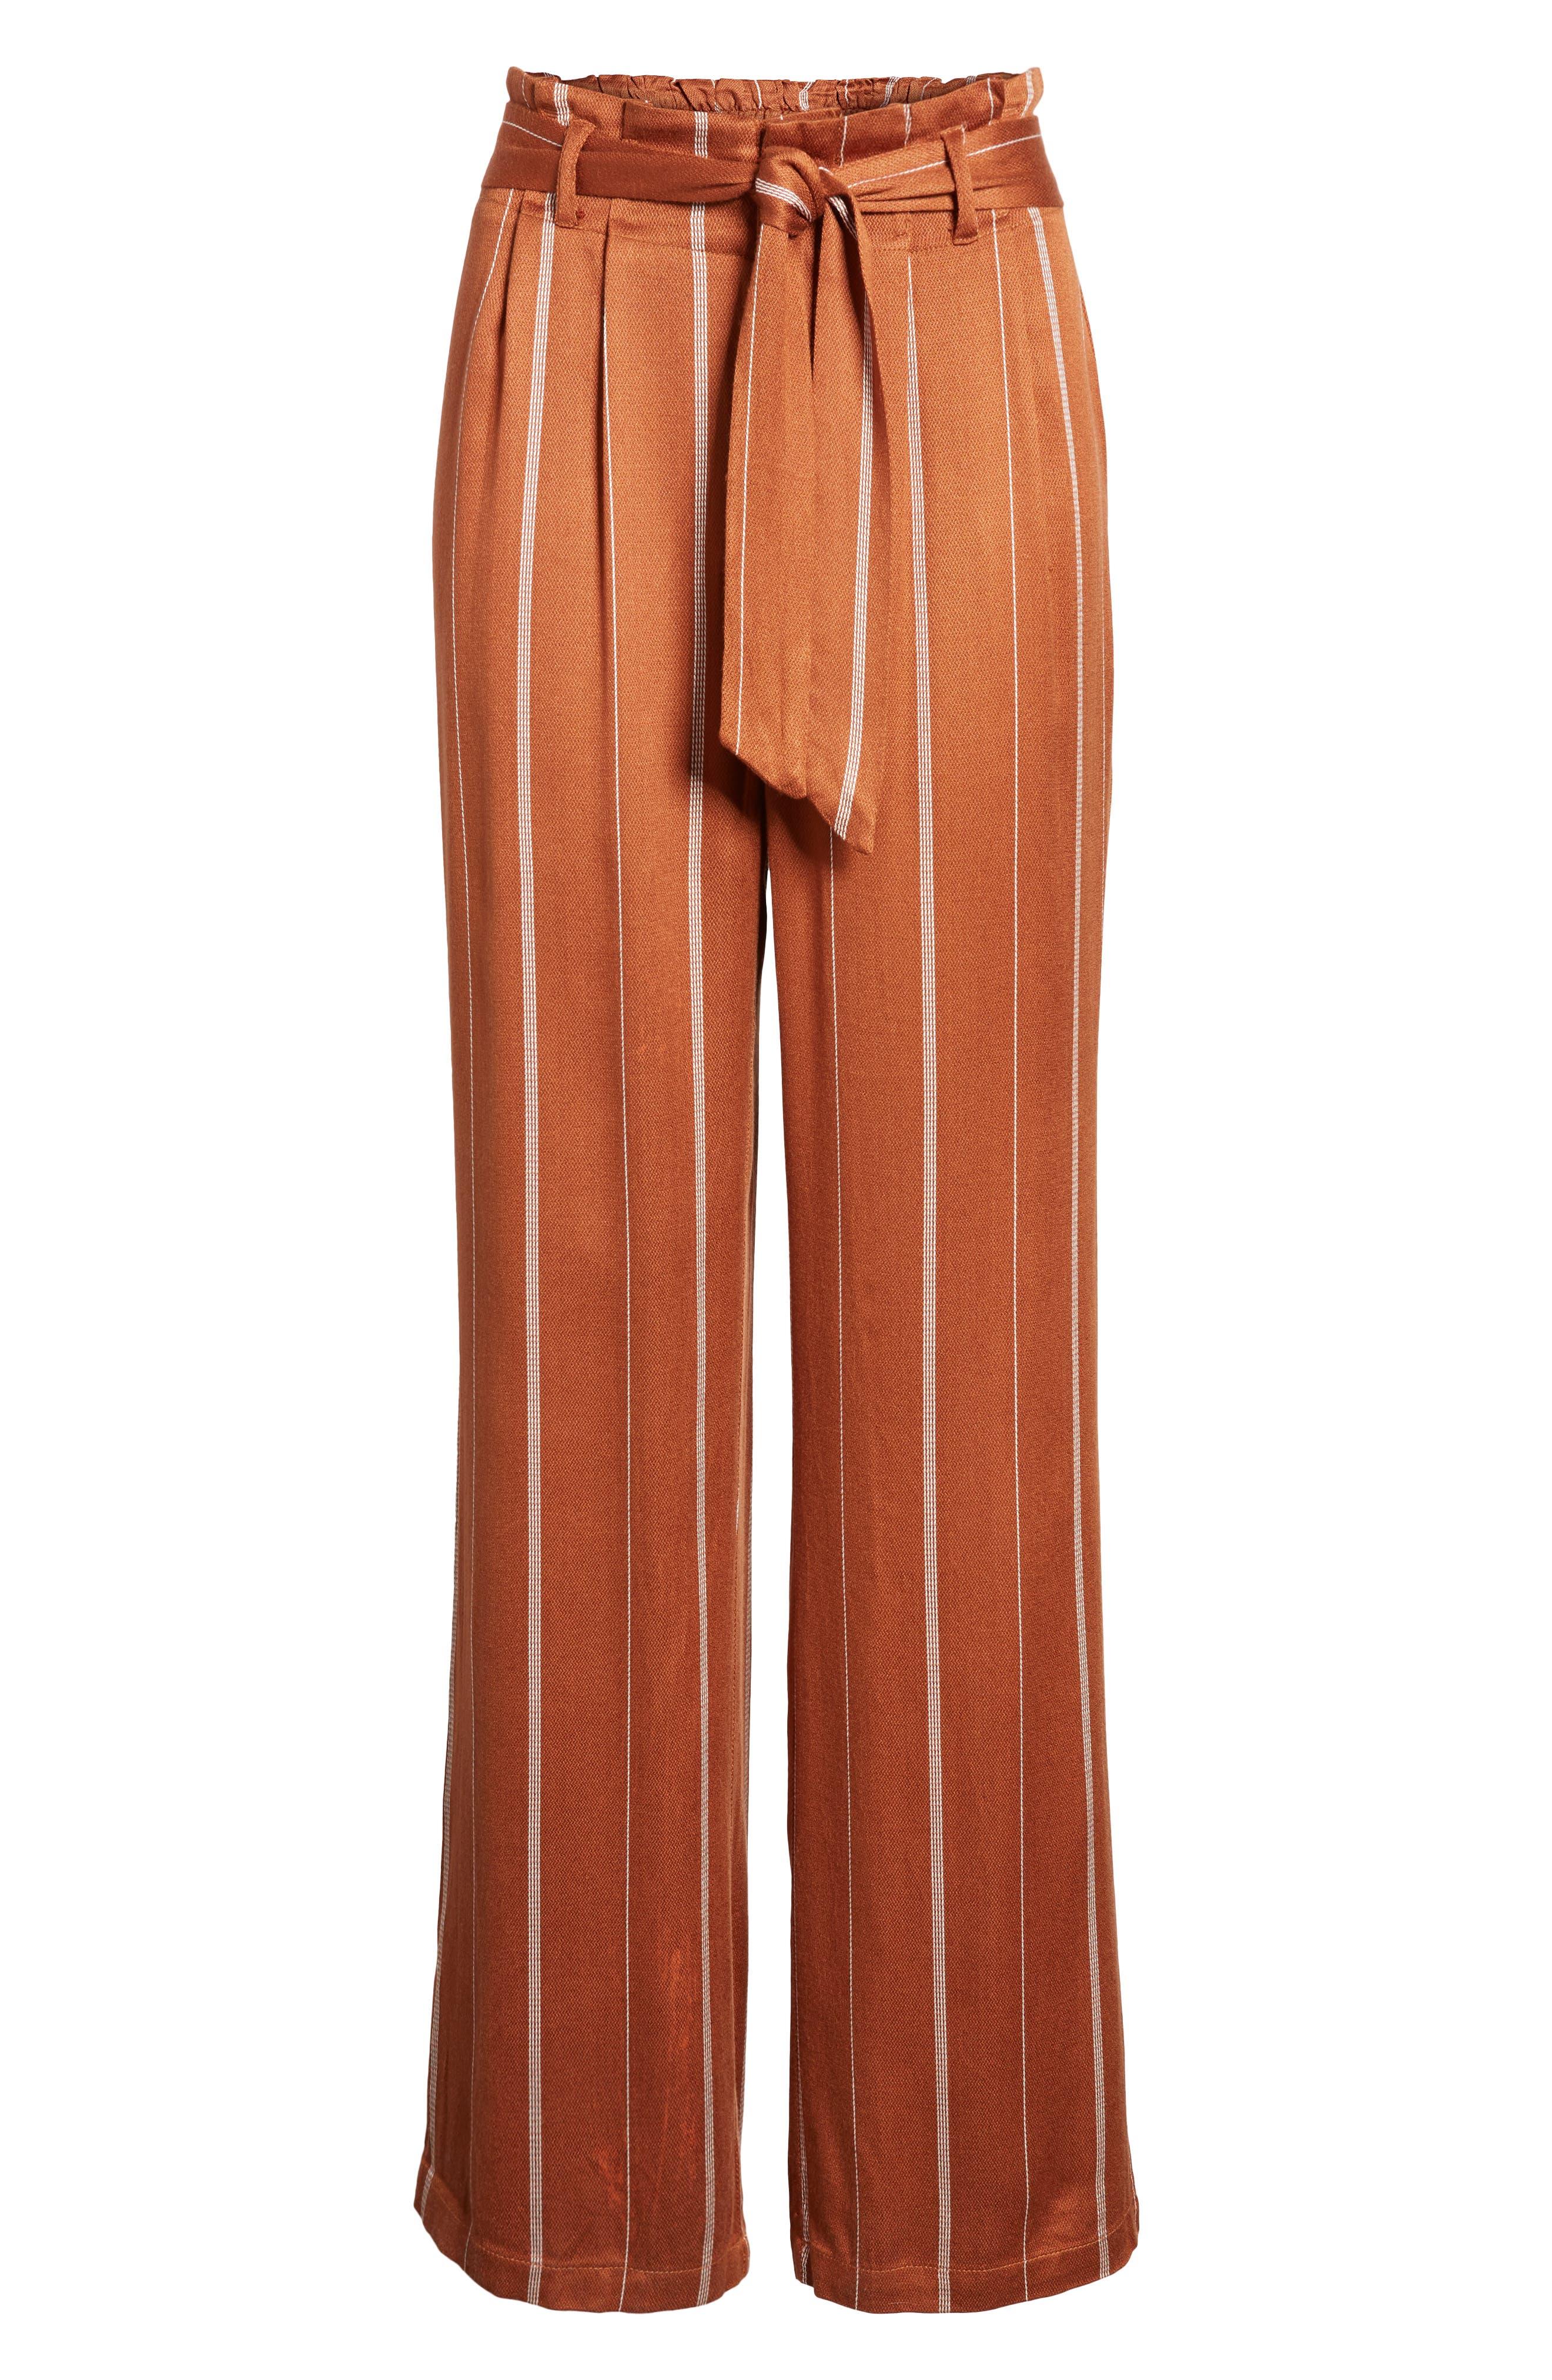 Paperbag Waist Pants,                             Alternate thumbnail 6, color,                             RUST CIDER/ CREAM STRIPES